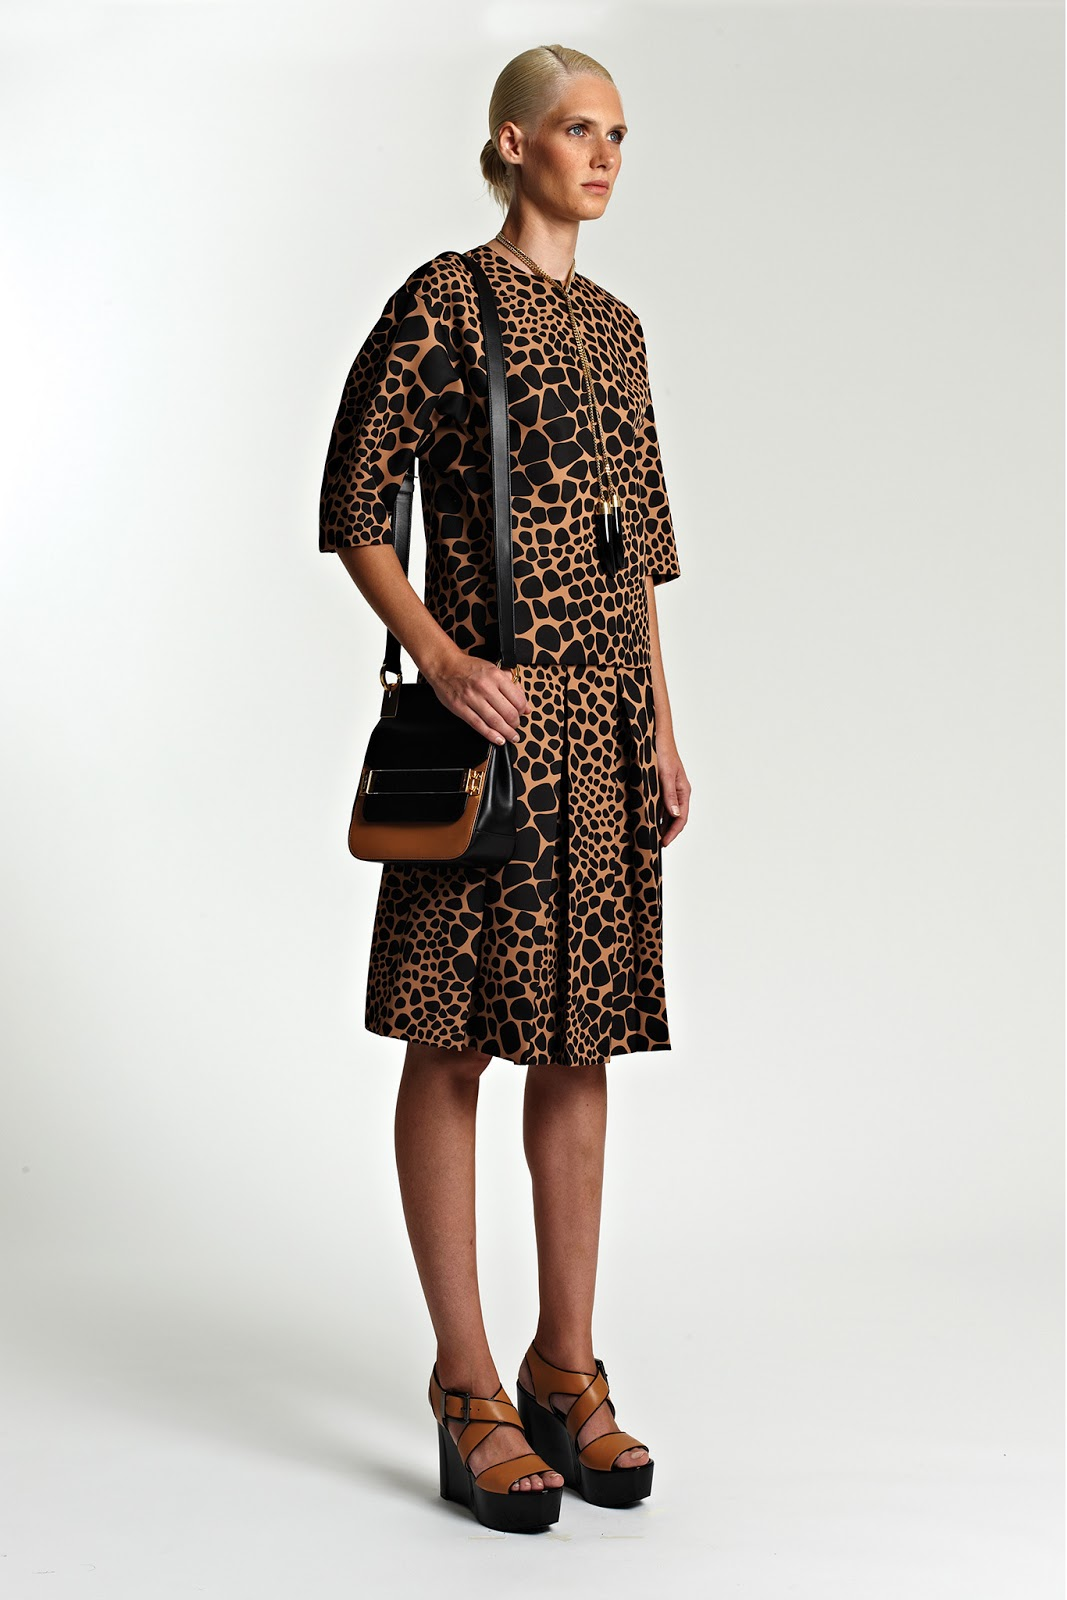 michael kors resort 2014 collection sos fashion alarm. Black Bedroom Furniture Sets. Home Design Ideas